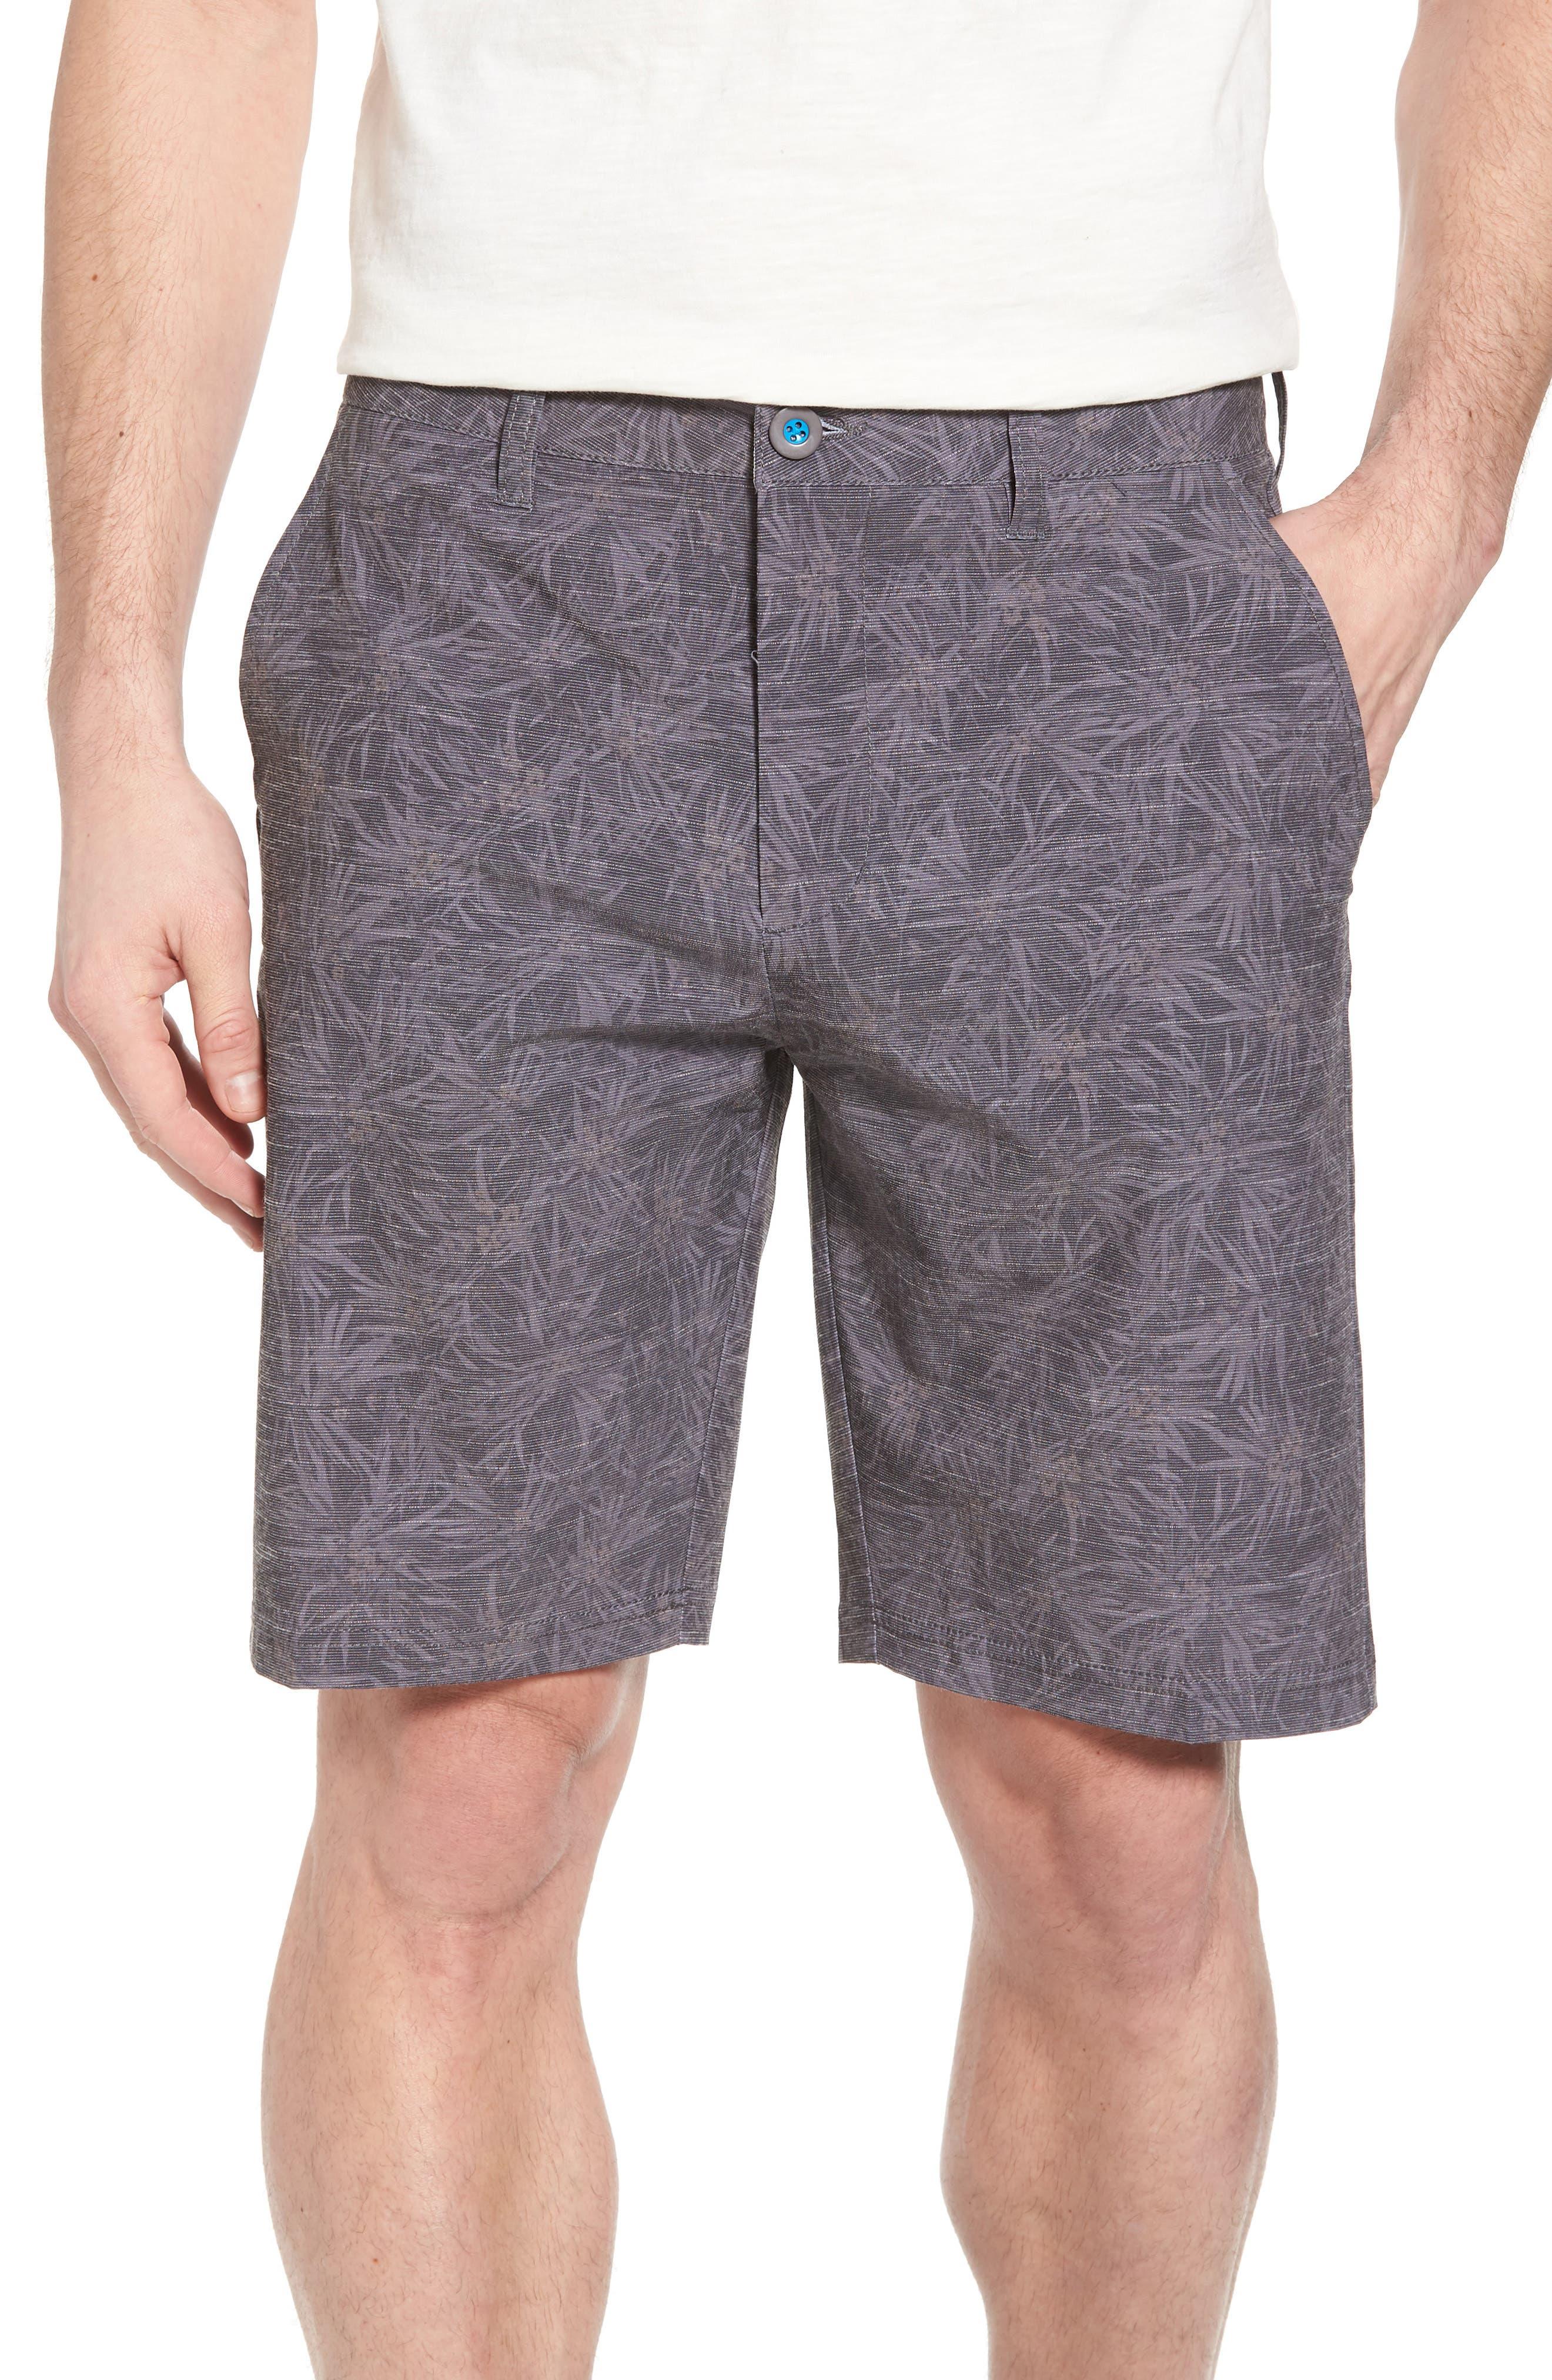 Cruiser Hybrid Shorts,                             Main thumbnail 1, color,                             Tropic Camo